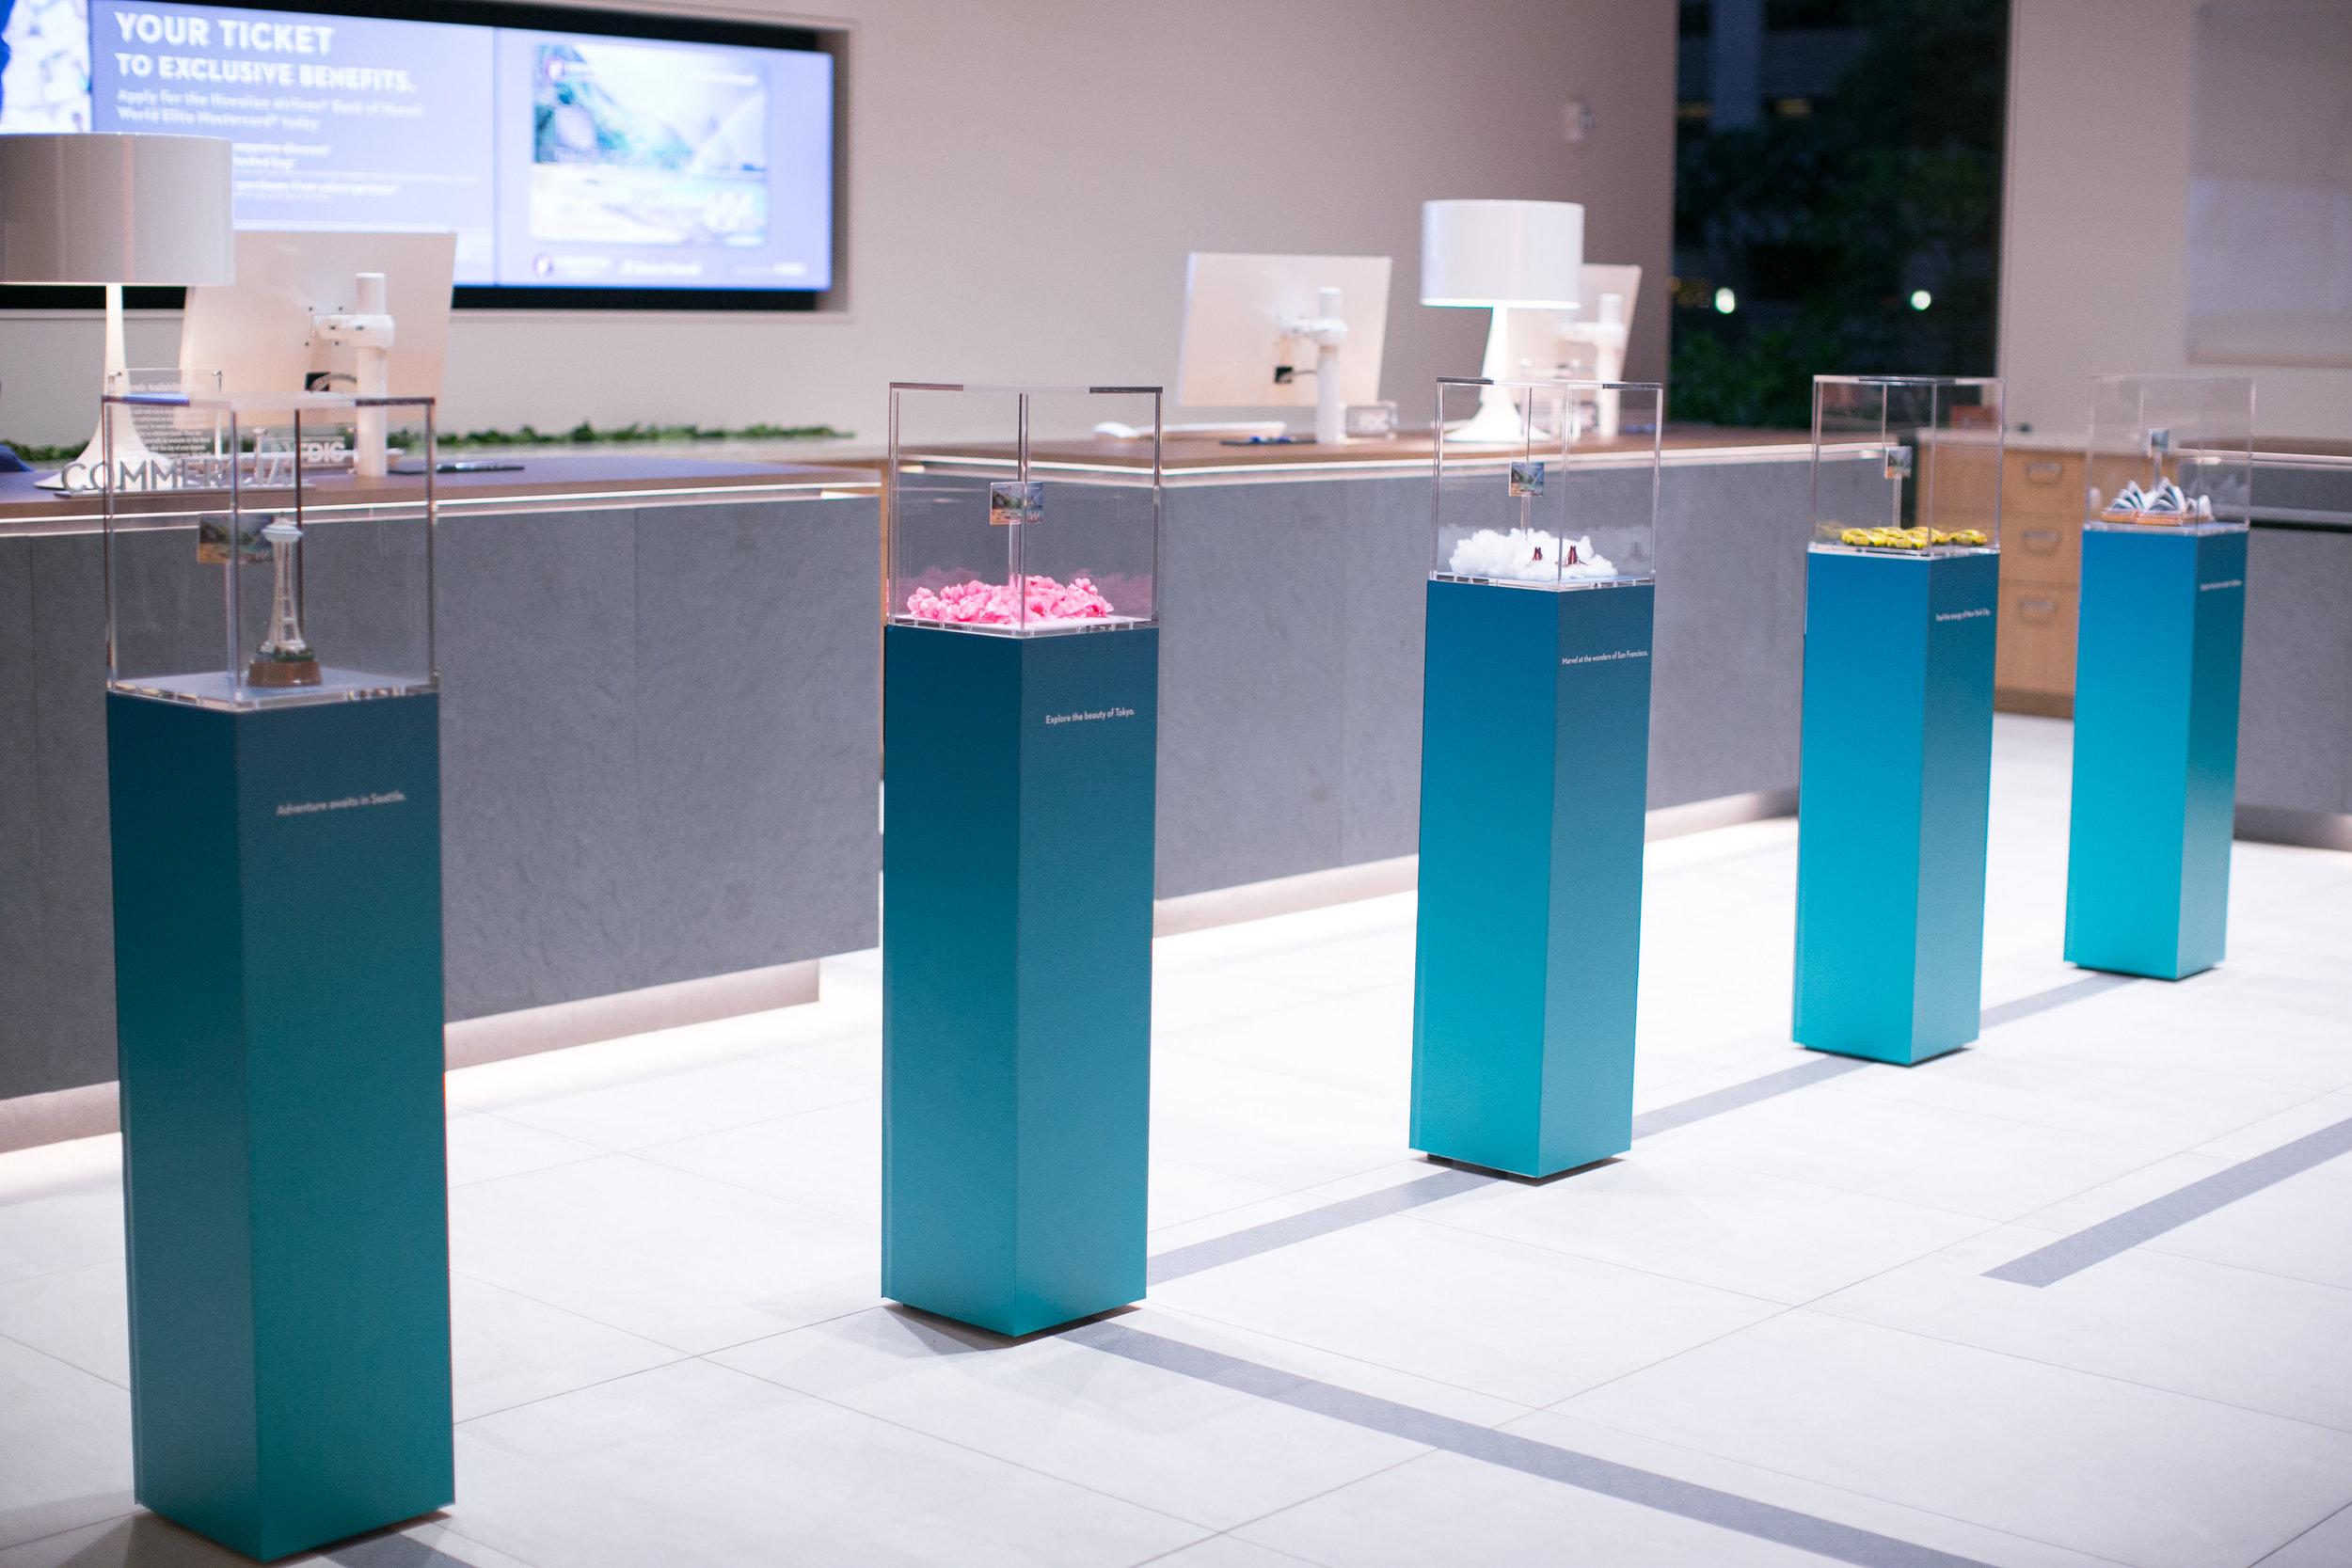 CURATE-BOH-Downtown-Display-Pedestals.jpg